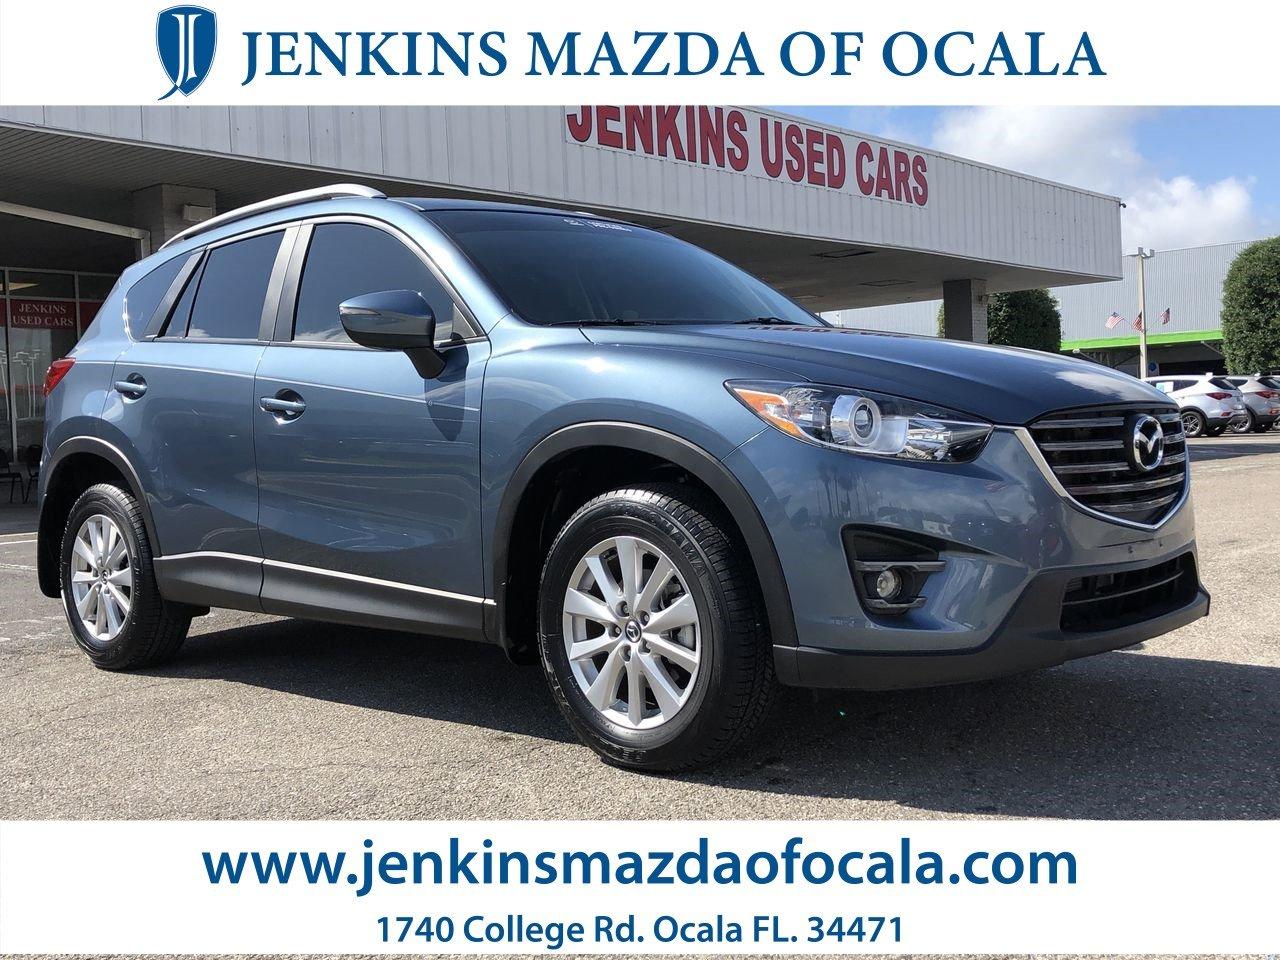 2016 Mazda Mazda CX-5 Touring (2016.5) SUV